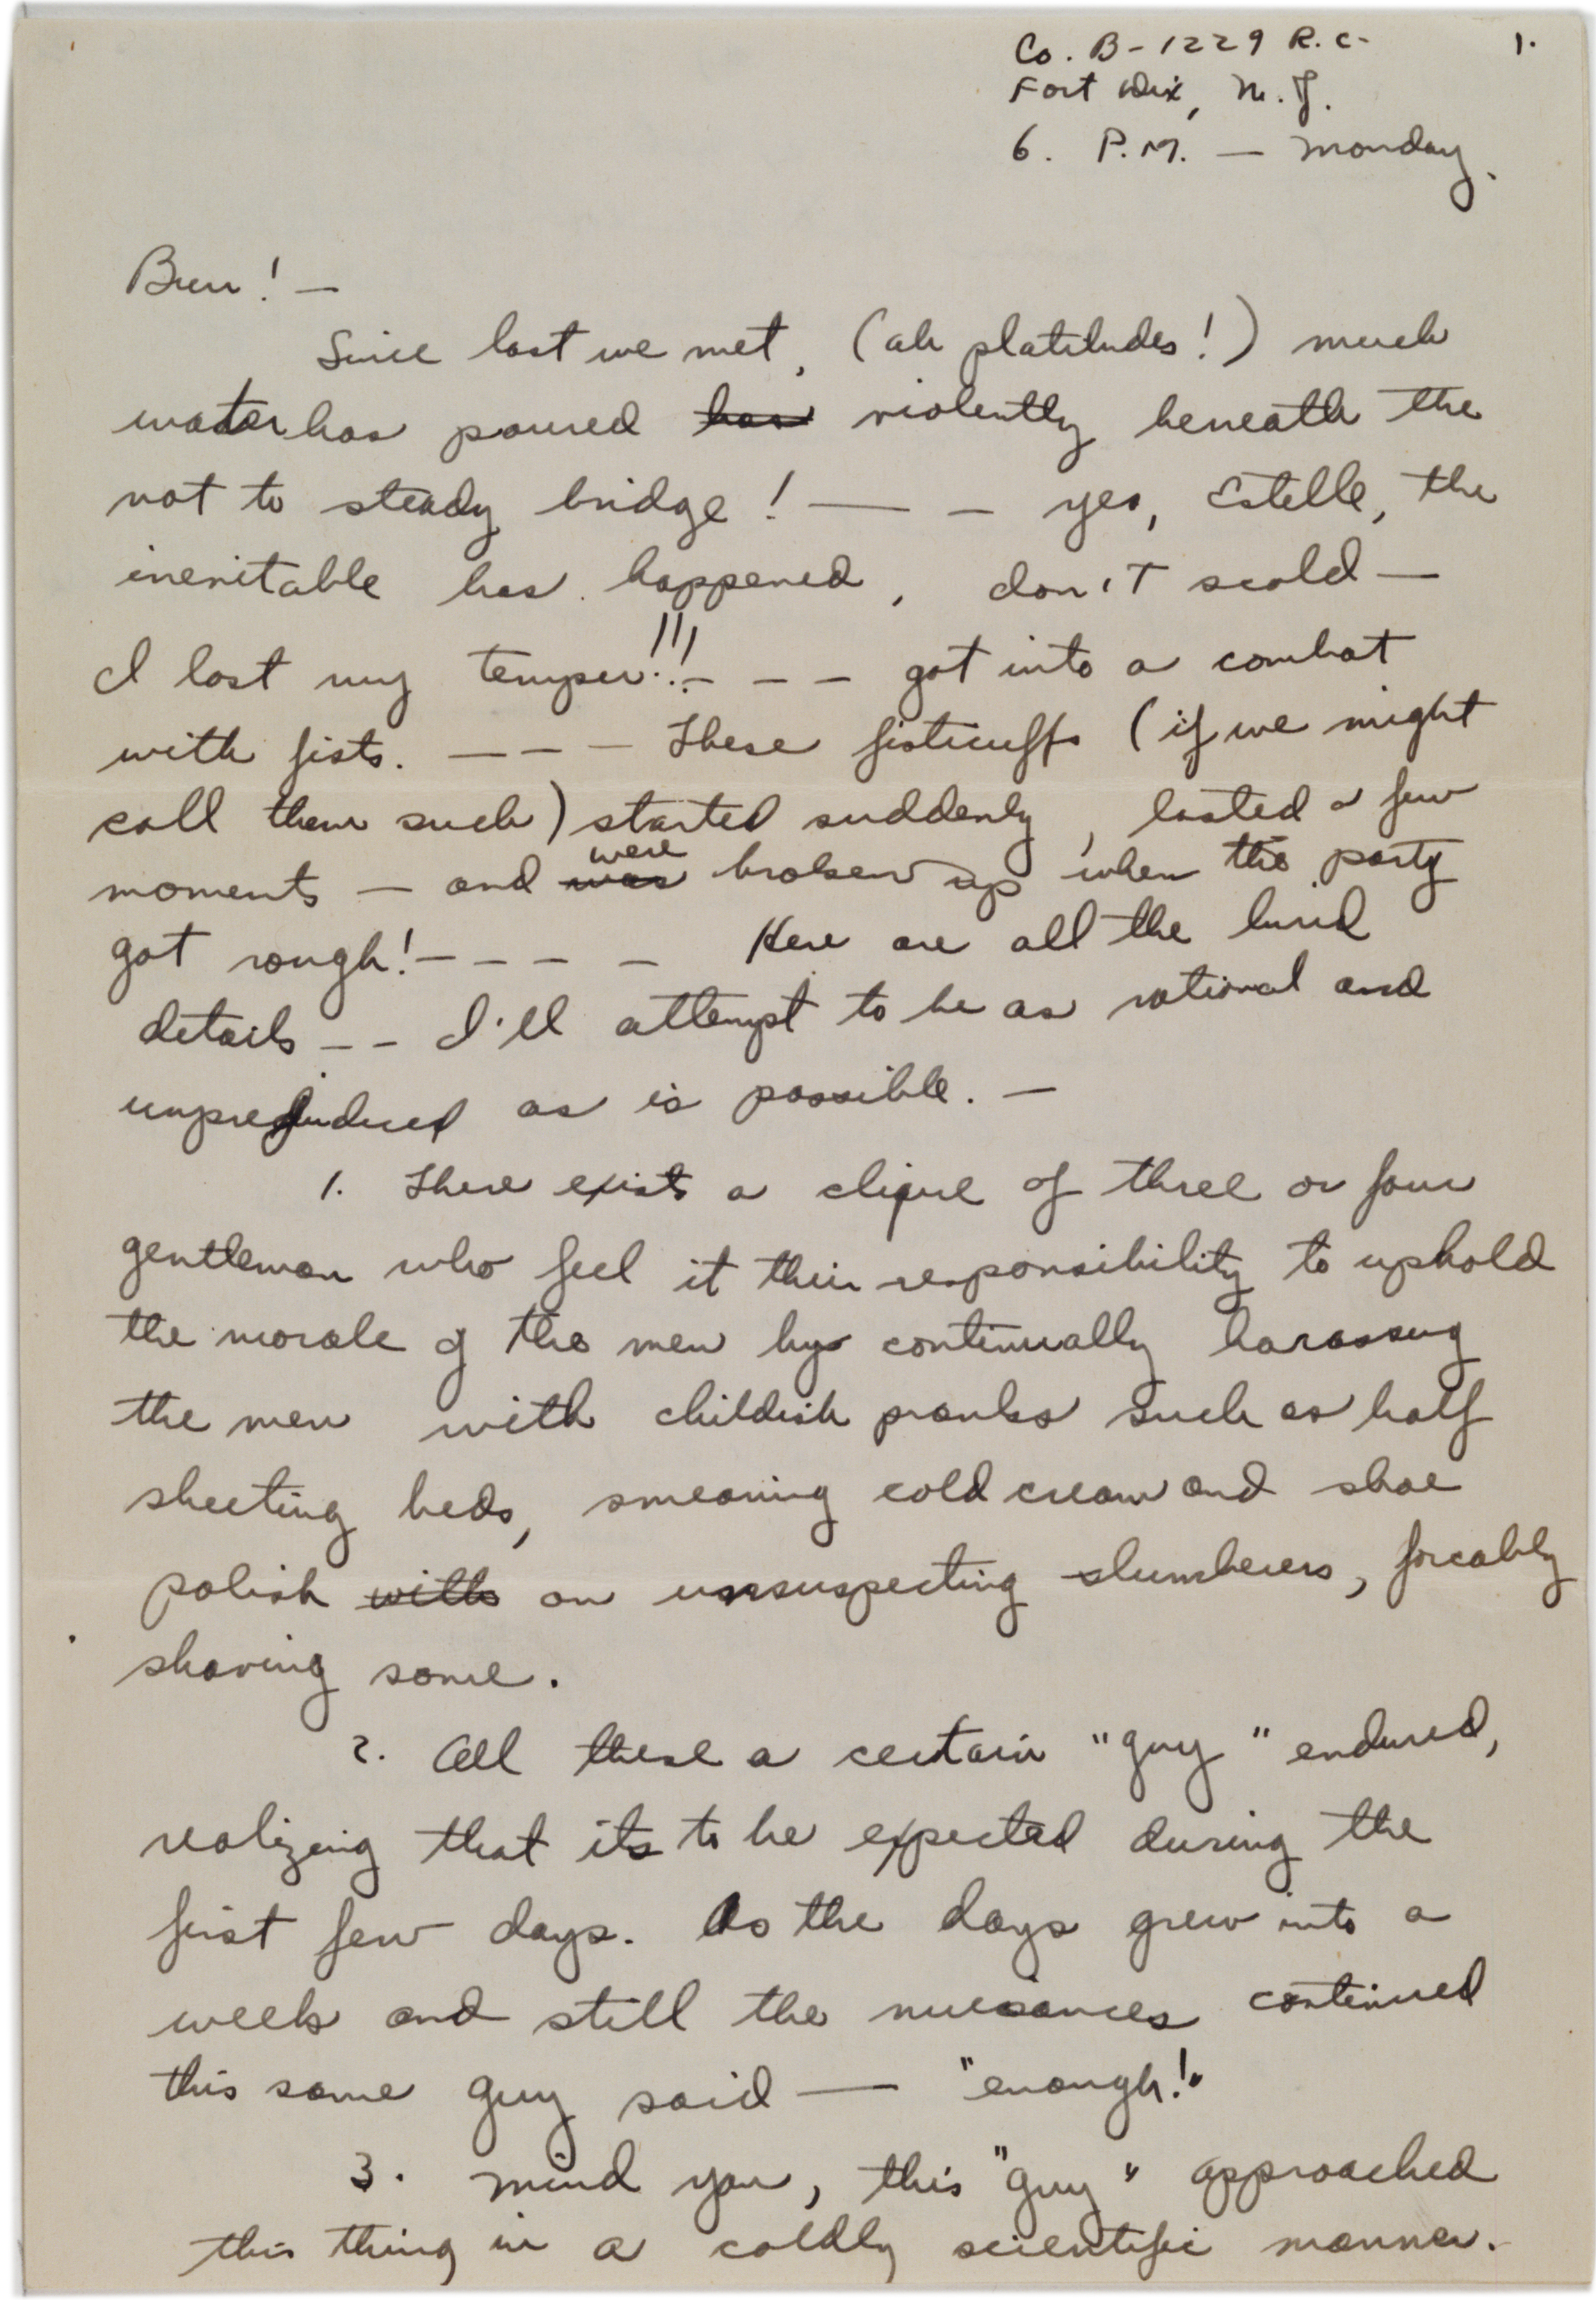 Sidney Diamond to Estelle Spero, ca. April 1942 (Gilder Lehrman Collection)